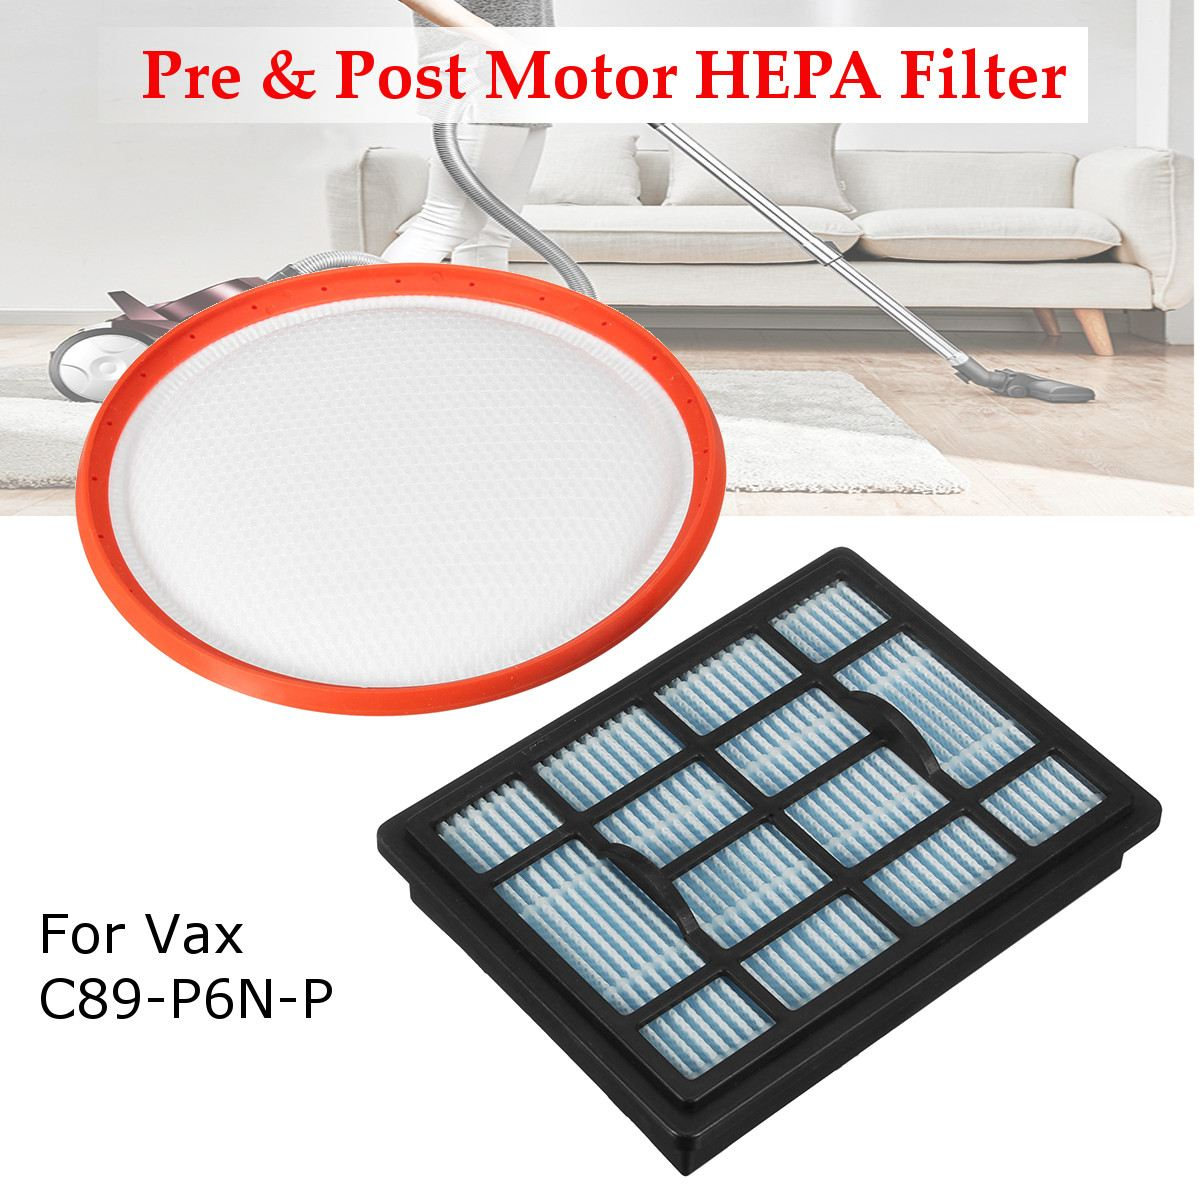 где купить KROAK Pre & Post Motor HEPA Filter For Vax Power 6 C89-P6N-P Vacuum Cleaner Hoover Filter Pad по лучшей цене